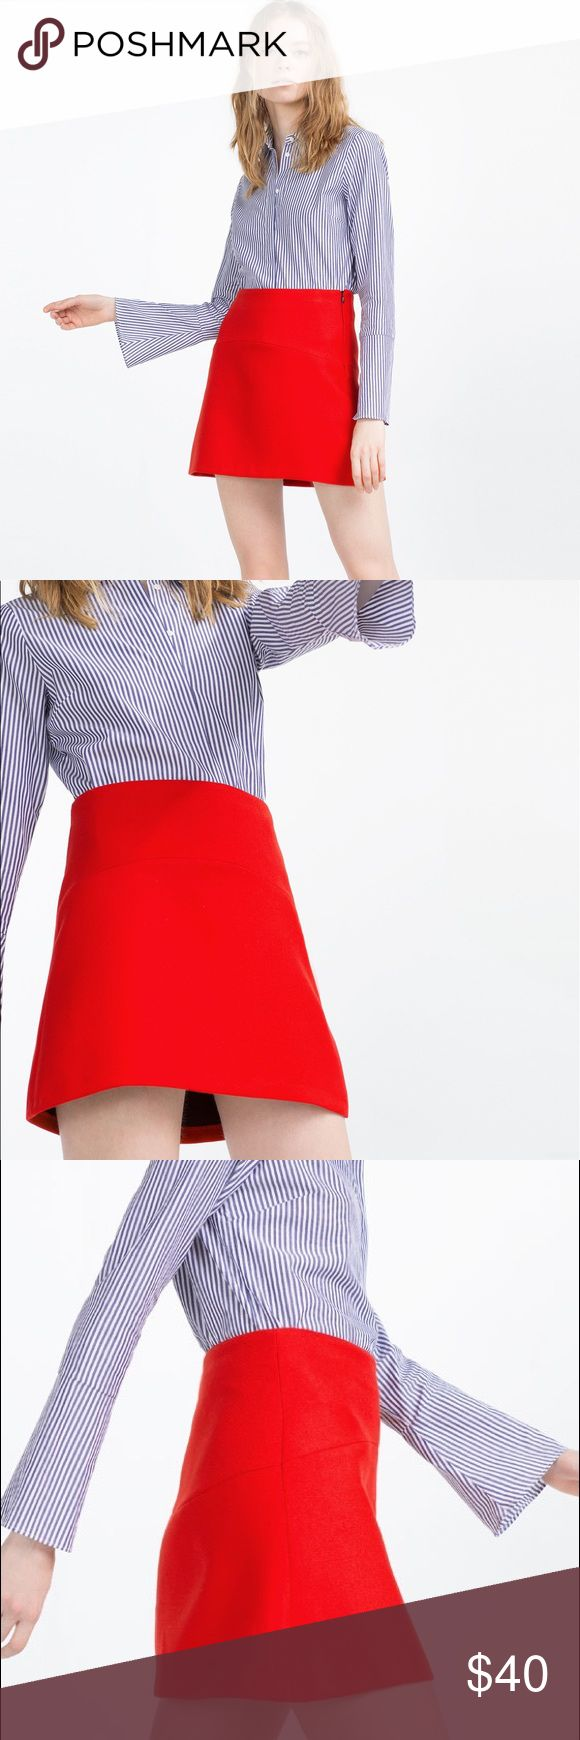 Zara Red Mini Skirt NWT - brand new and never been worn!                                          Feel free to make an offer😊 Zara Skirts Mini